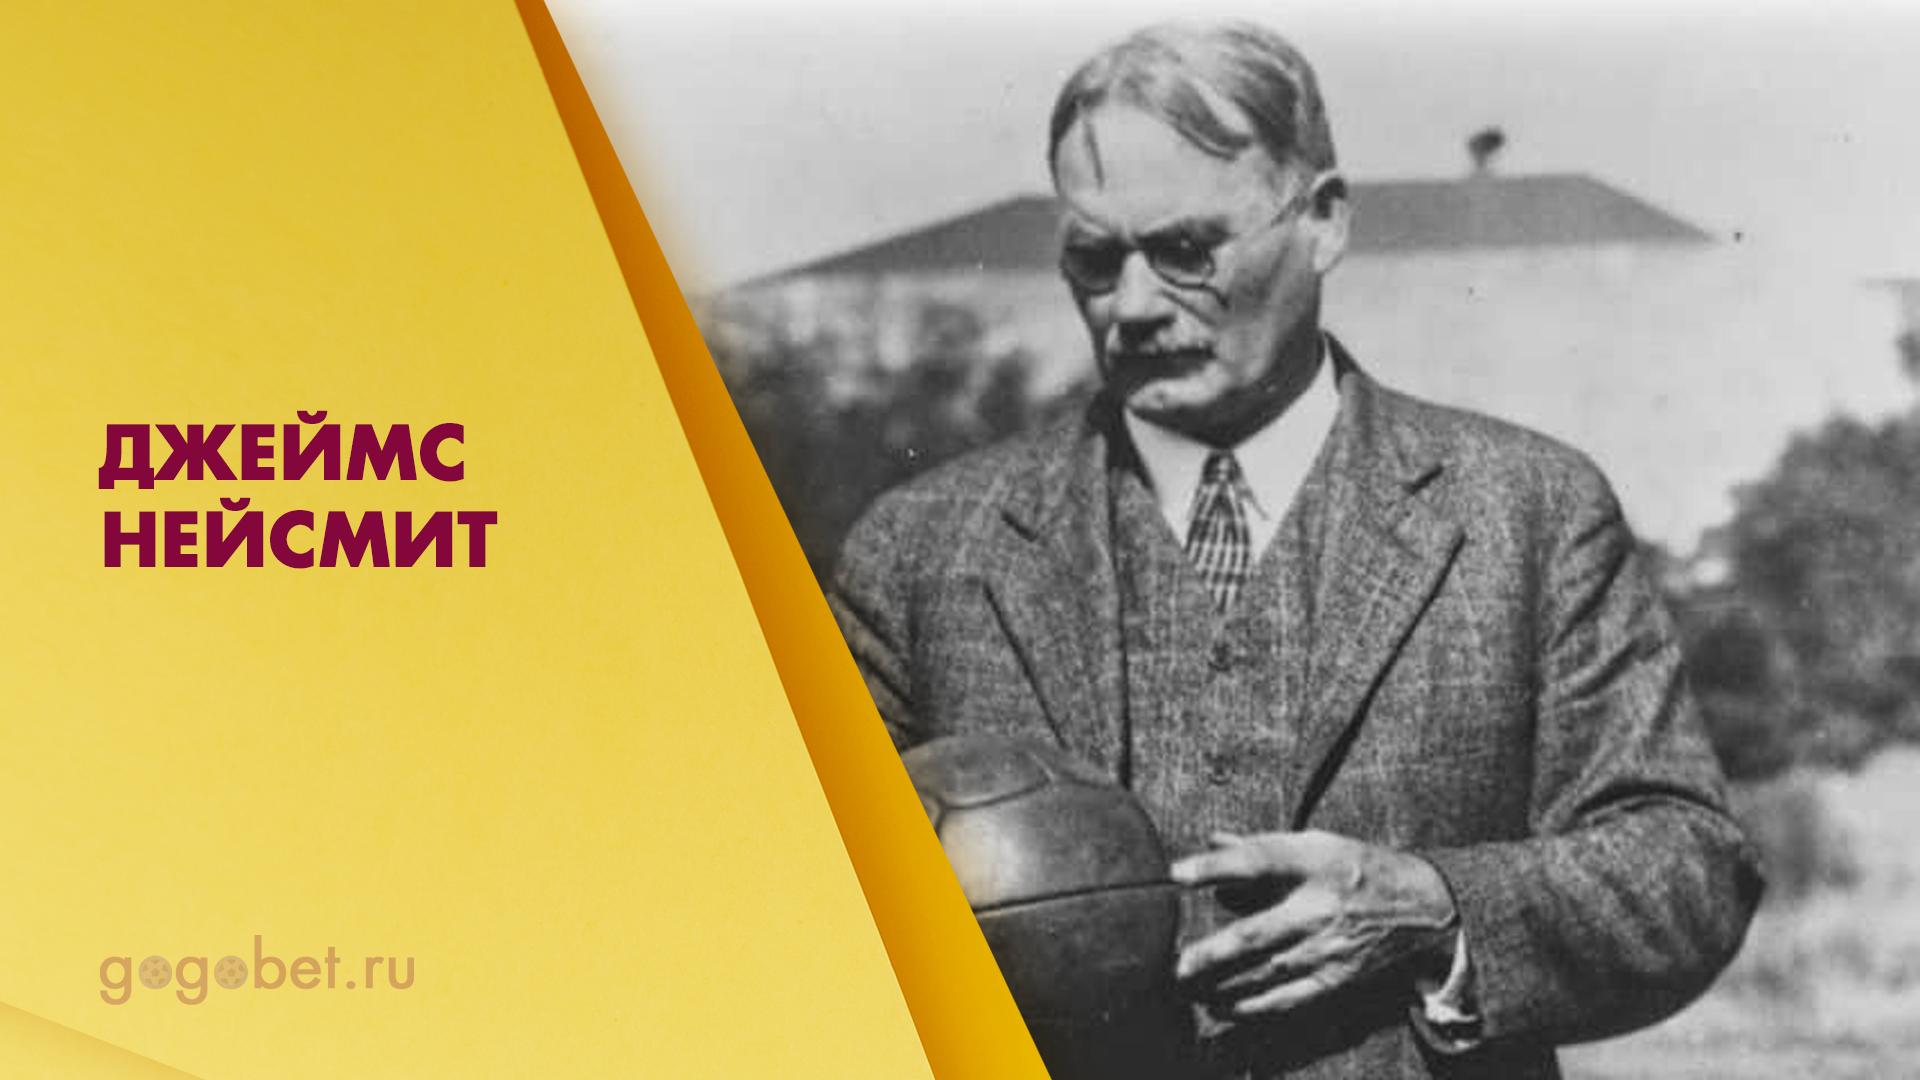 Джеймс Нейсмит - создал правила баскетбола